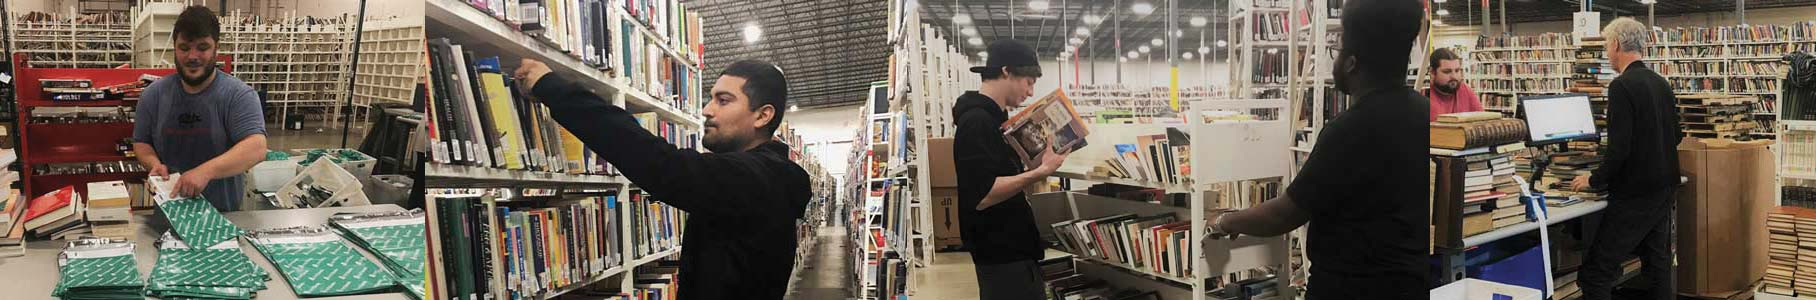 ThriftBooks Teamwork